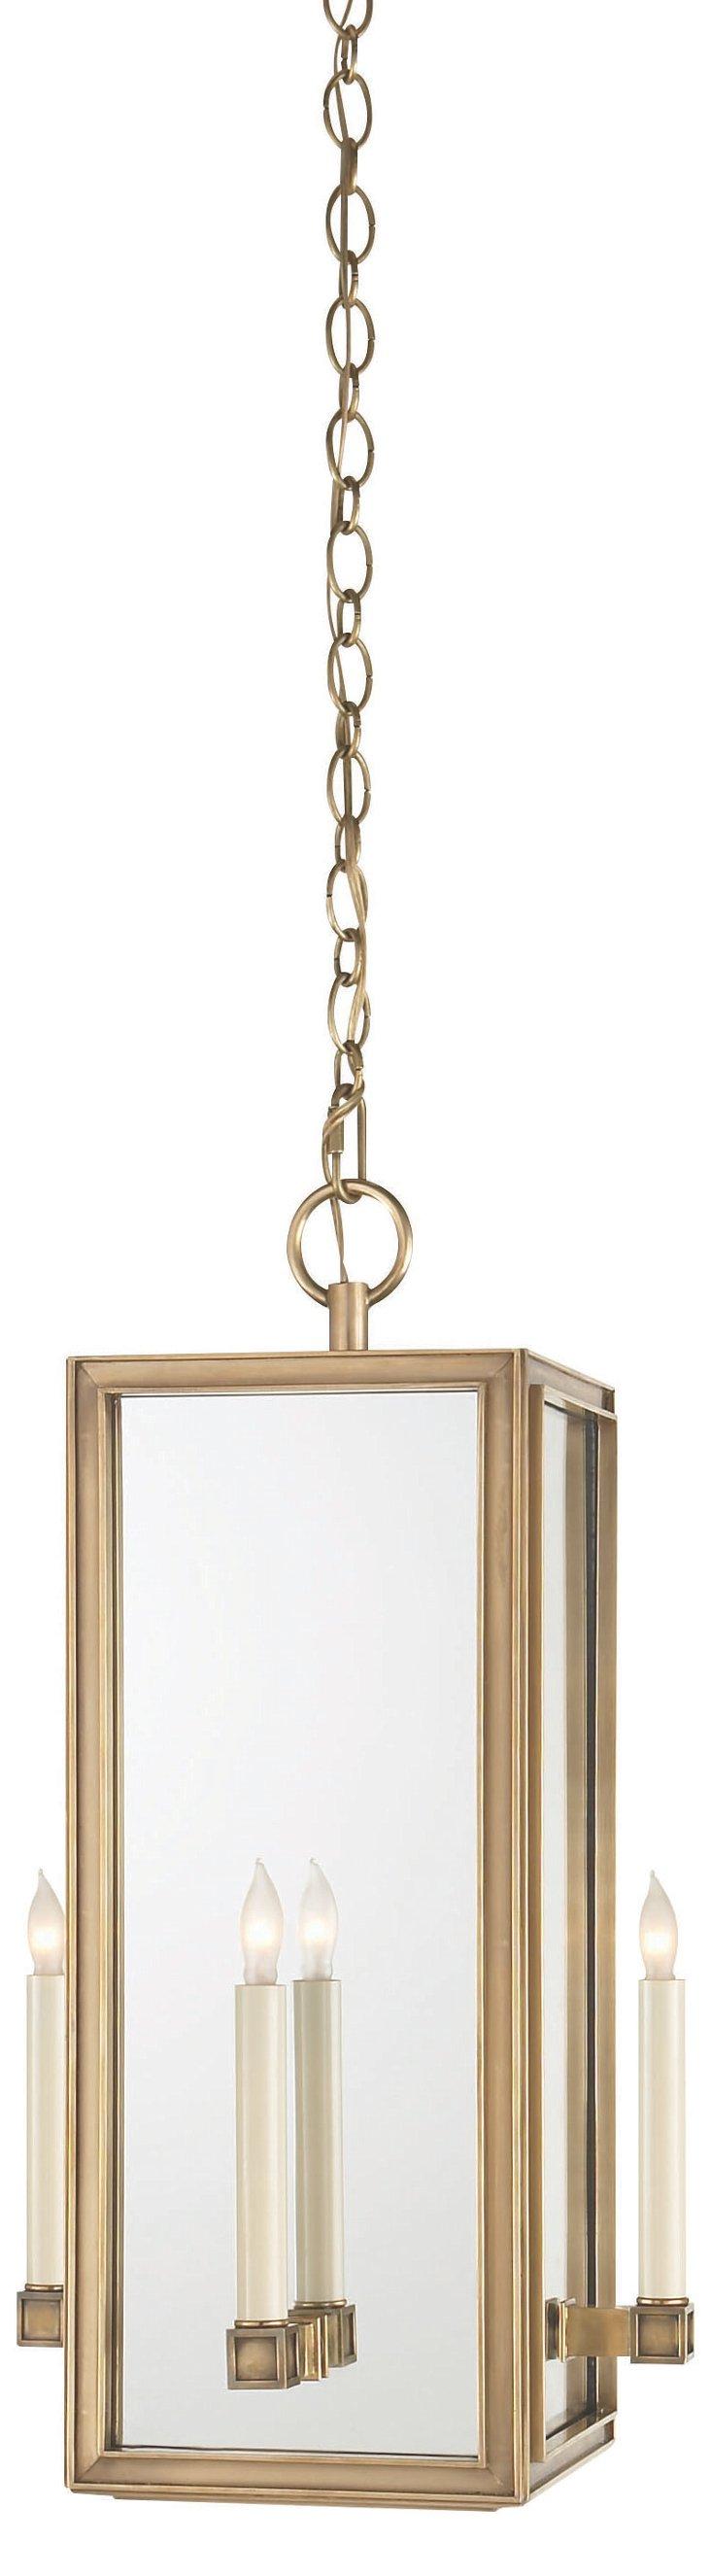 Lund 4-Light Pendant, Brass